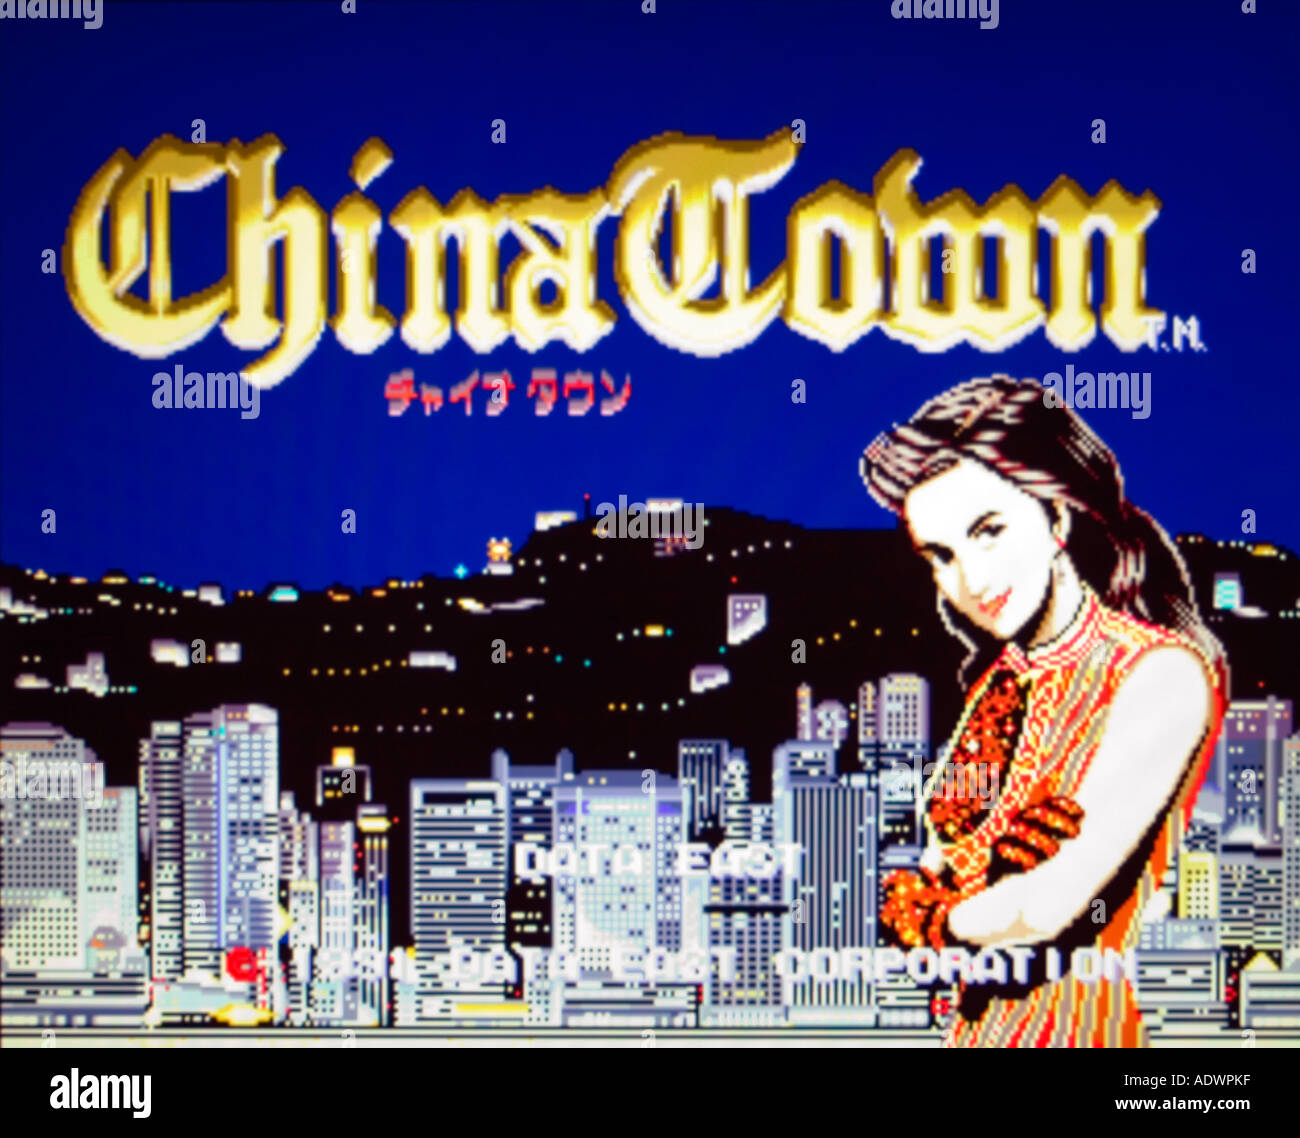 china town nihon bussan av japan 1991 vintage arcade videogame stock